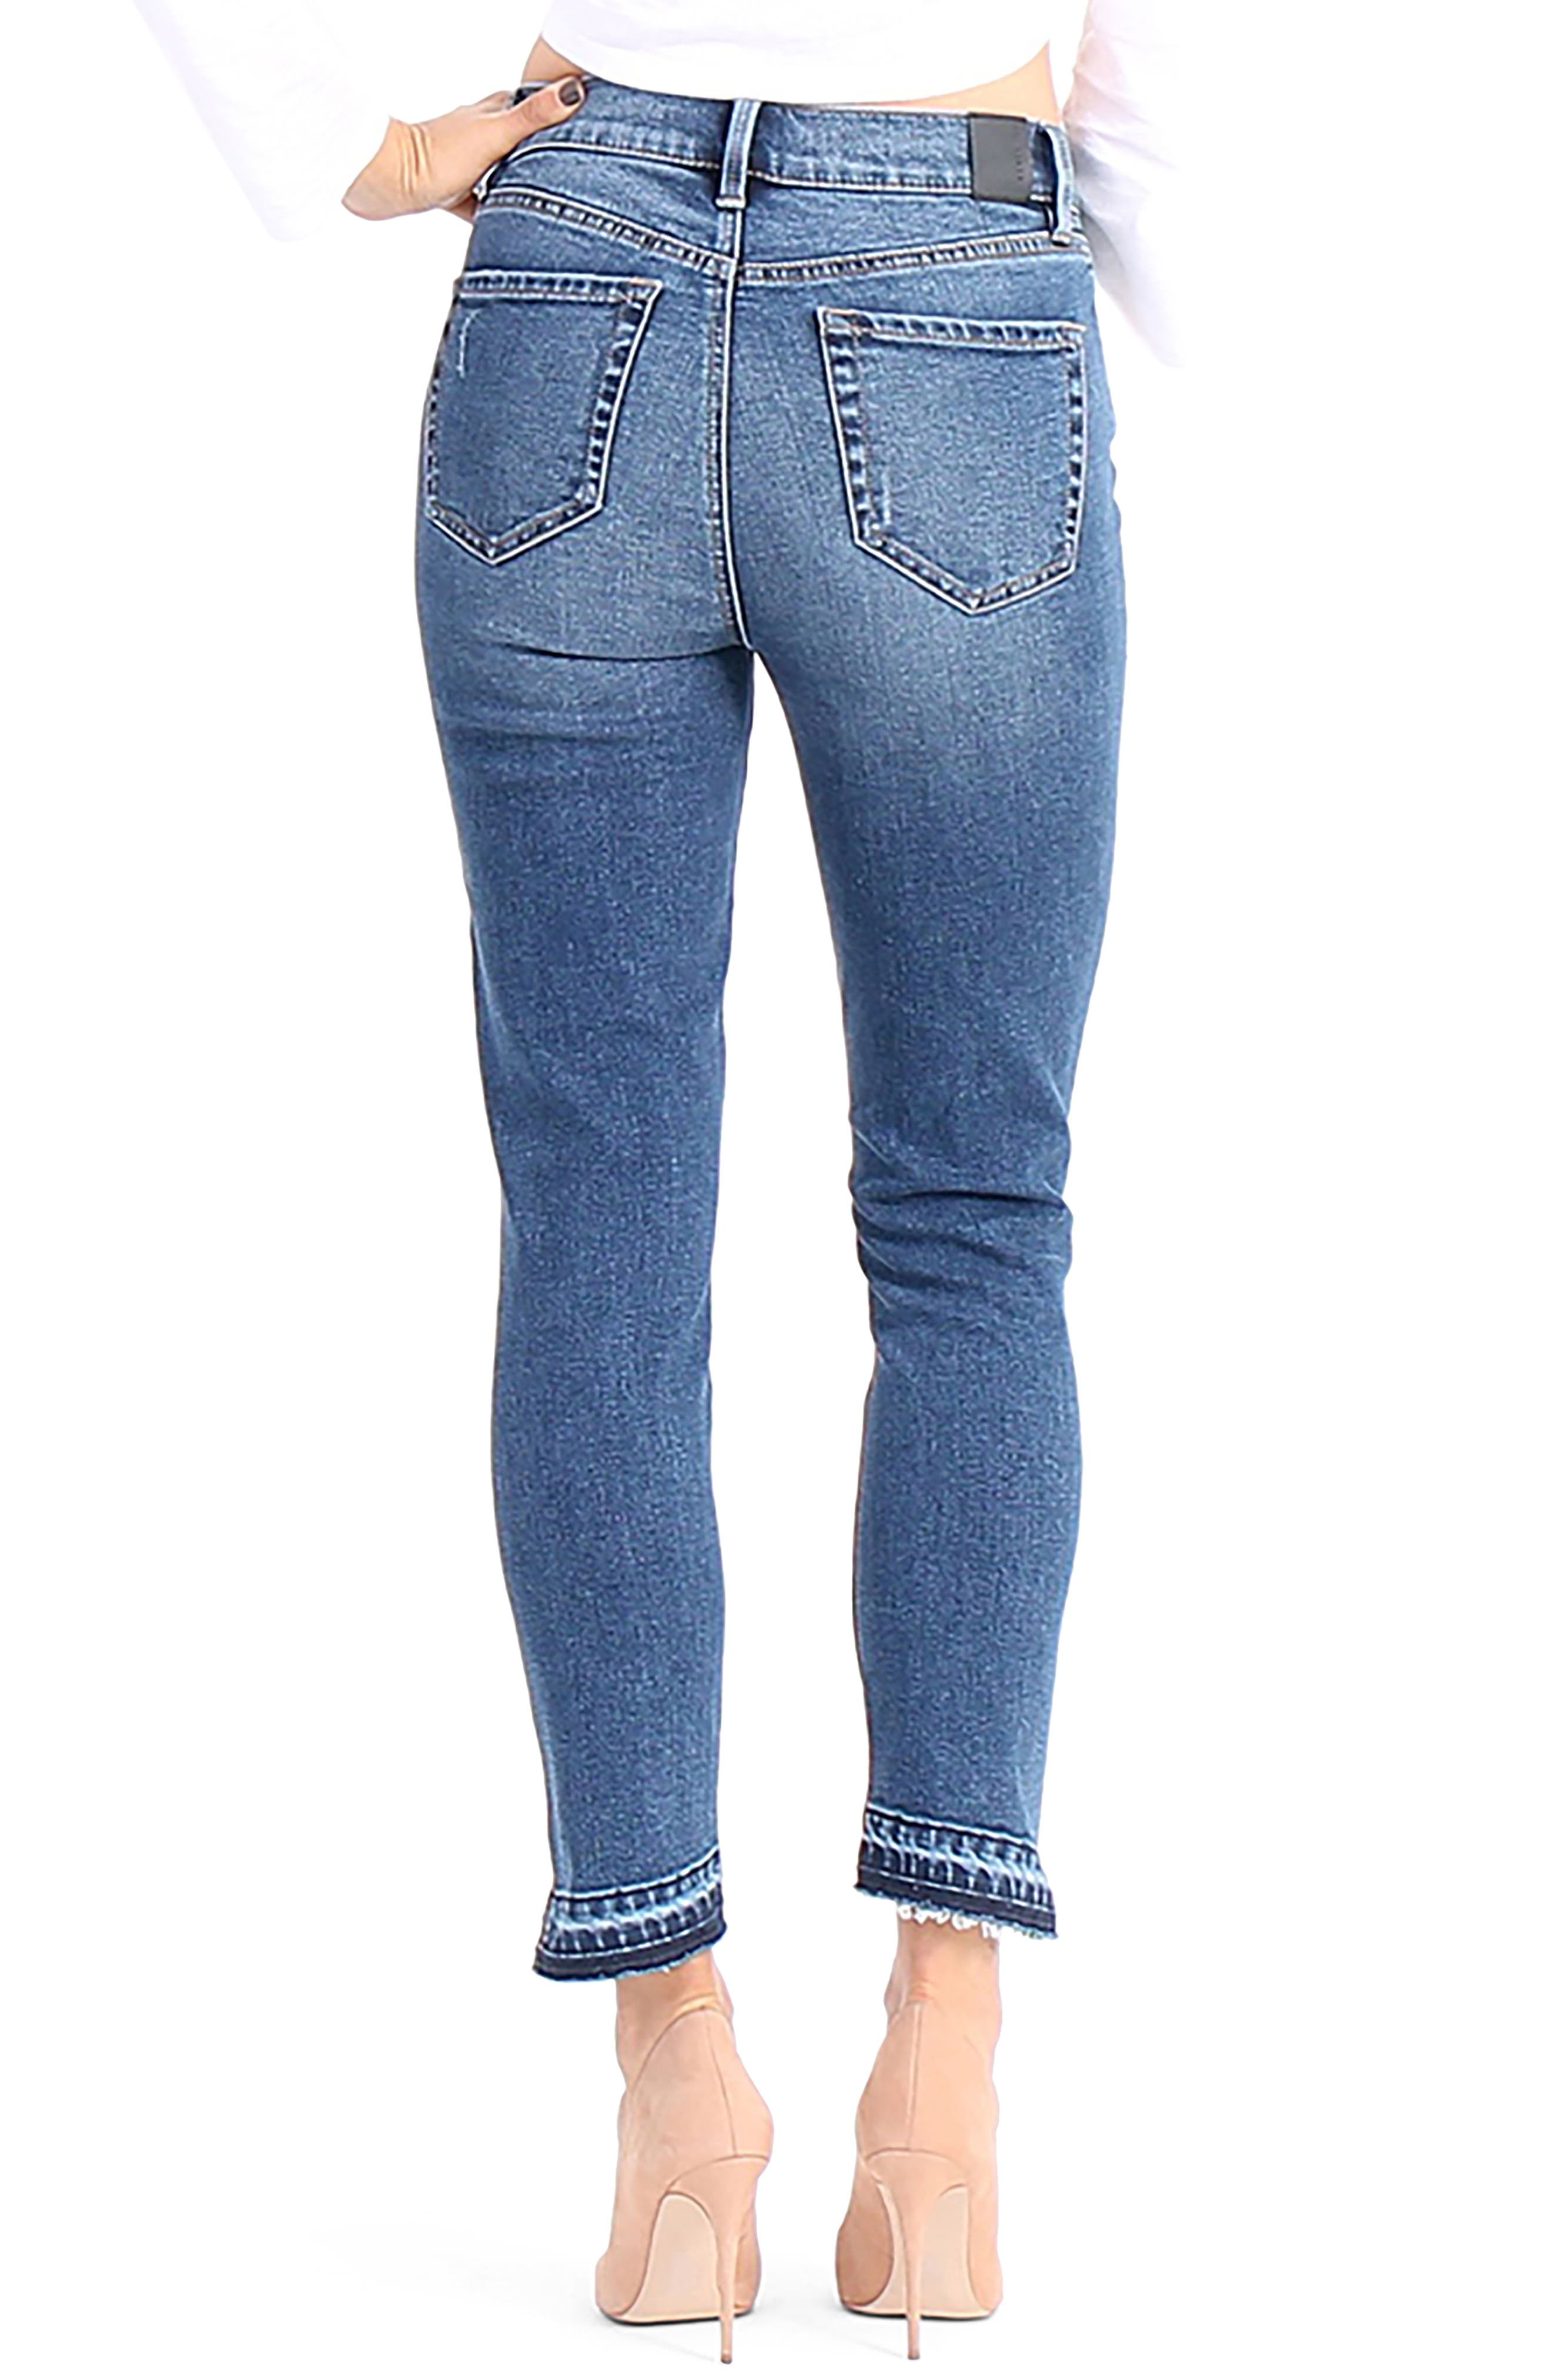 Elle Uneven Hem Skinny Jeans,                             Alternate thumbnail 2, color,                             426